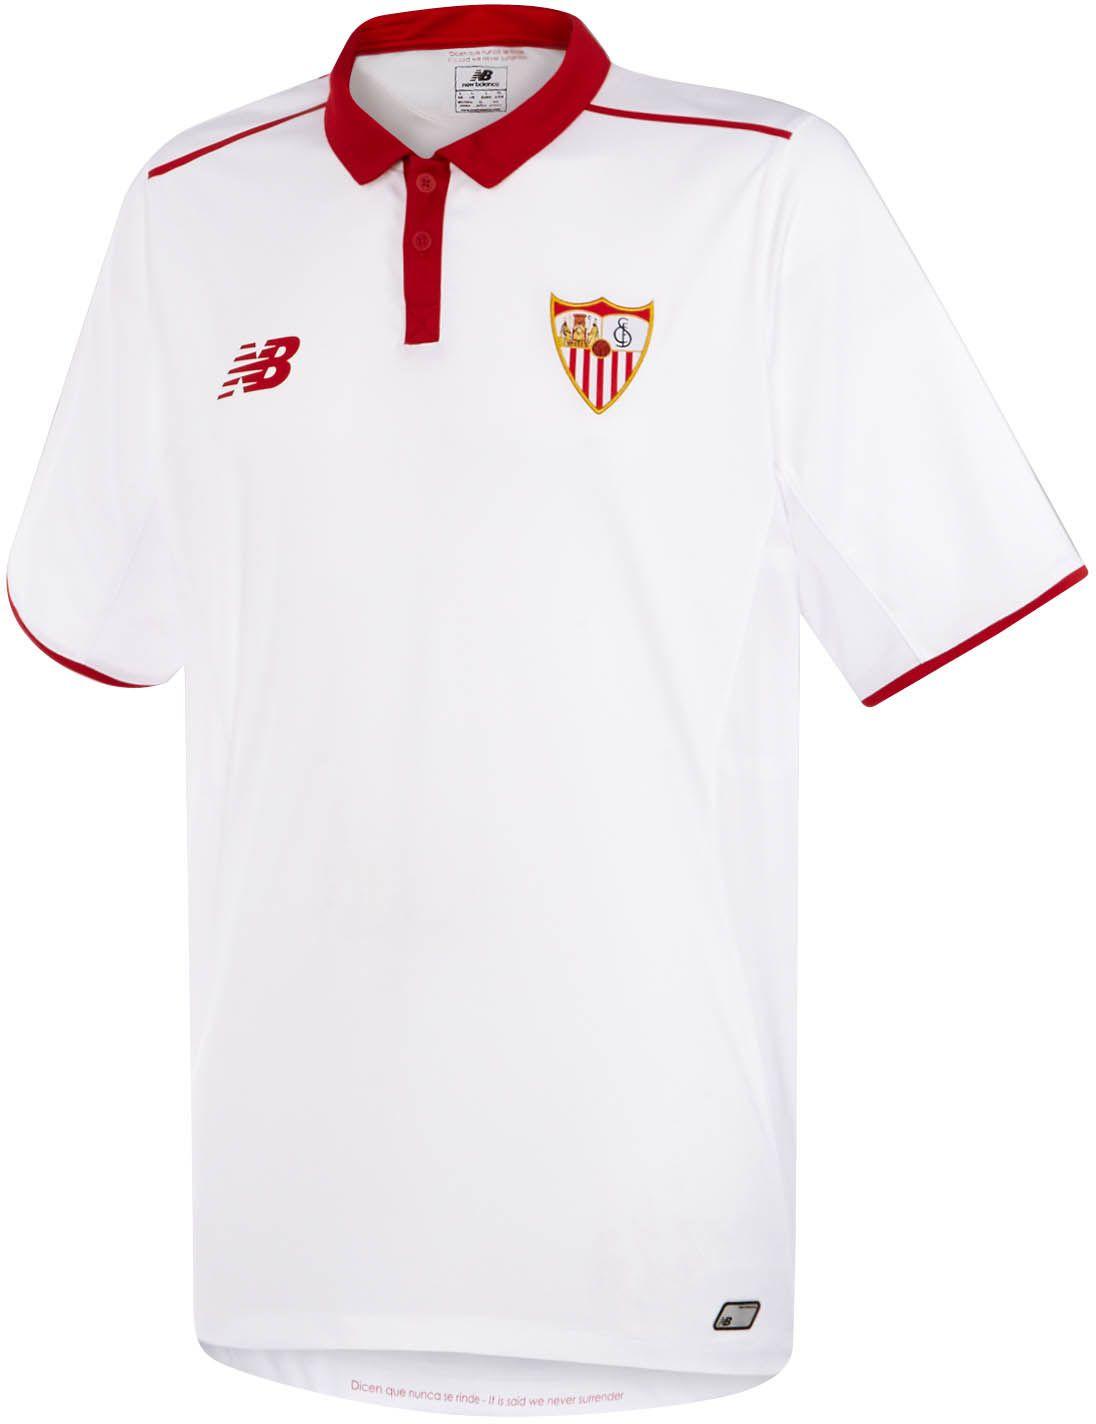 Sevilla 16 17 Home Kit Released Camisetas De Fútbol Fútbol Rugby Camisas